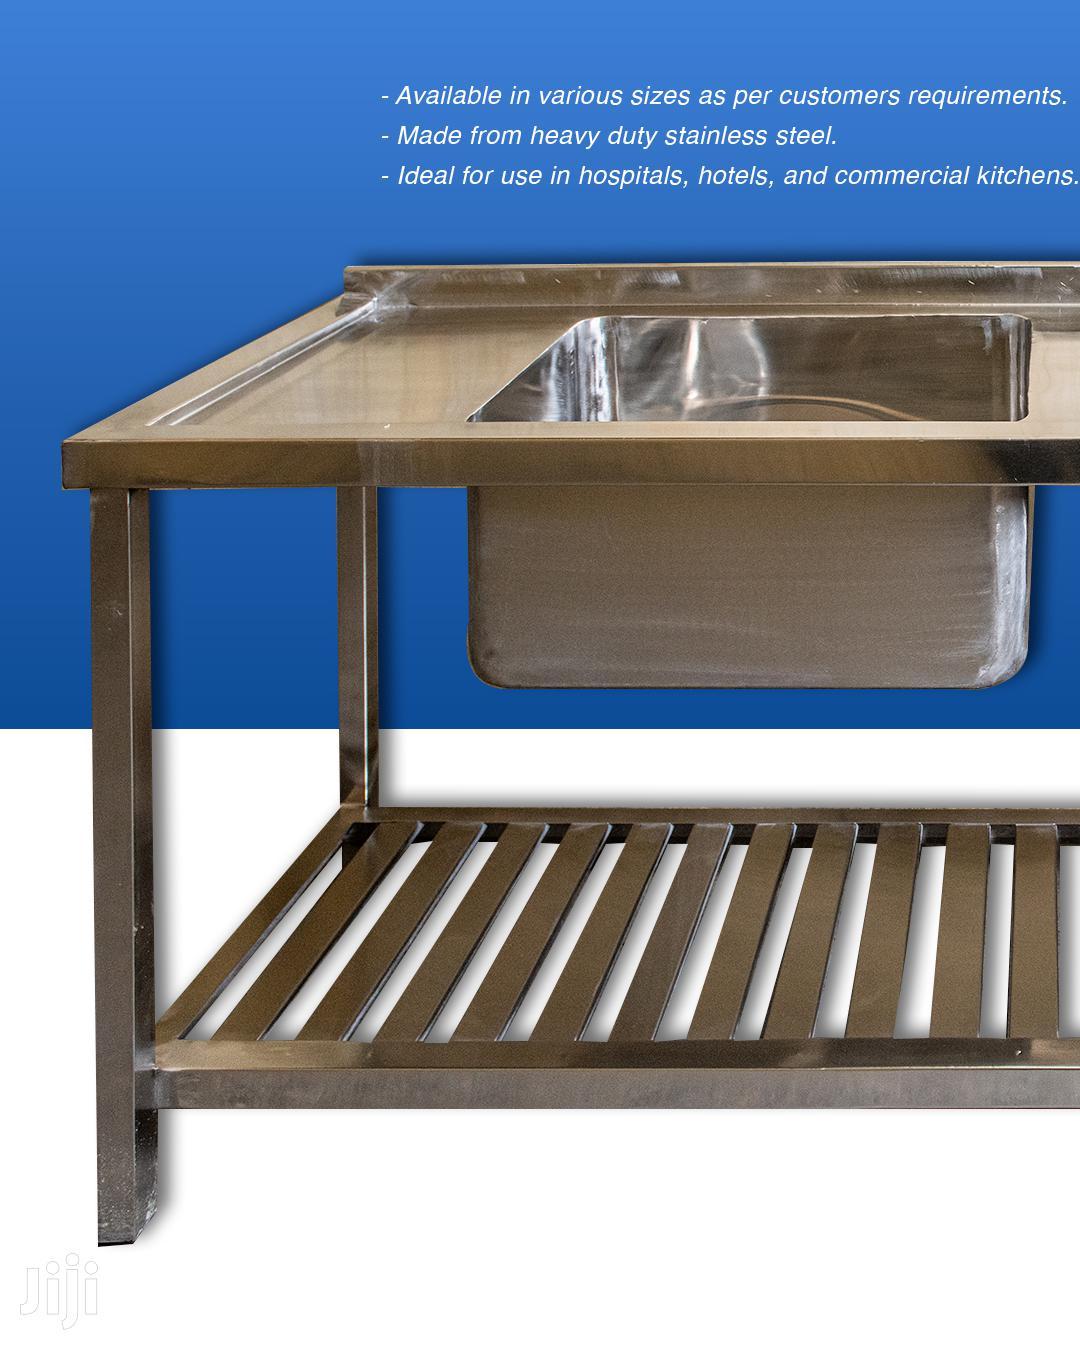 Stainless Steel Commercial Kitchen Sinks | Restaurant & Catering Equipment for sale in Industrial Area Nairobi, Nairobi, Kenya